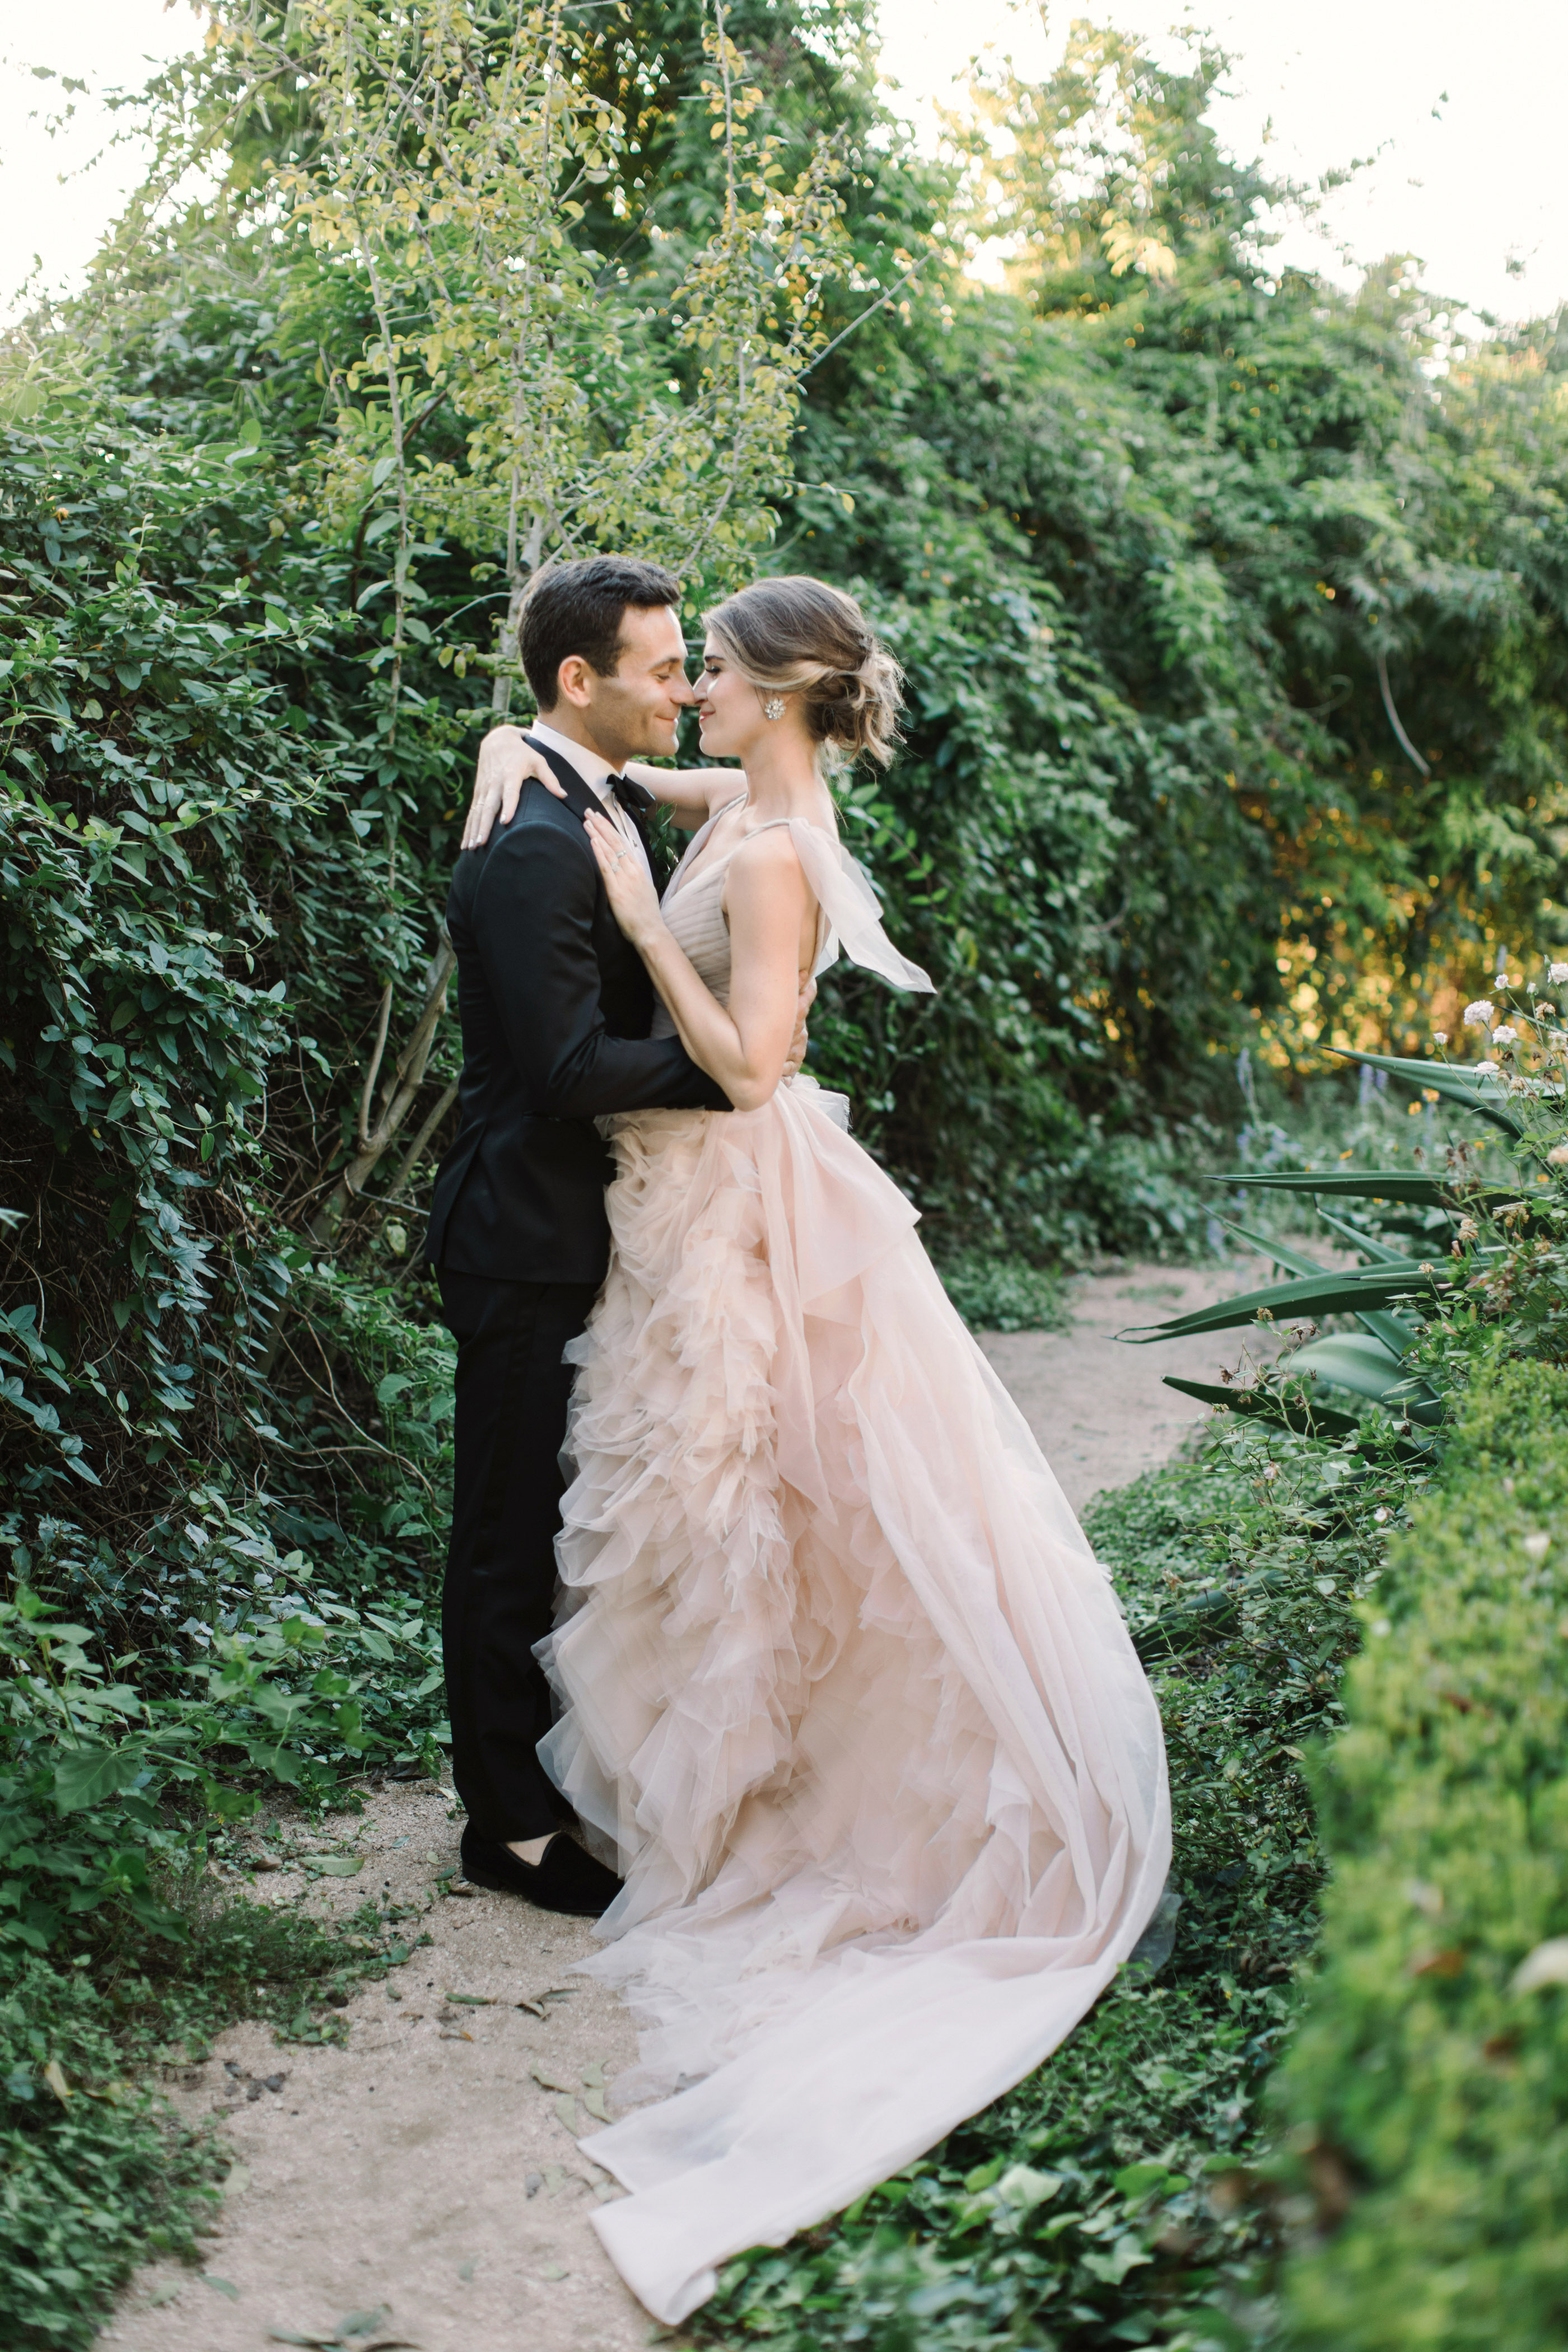 wedding couple portraits embrace greenery